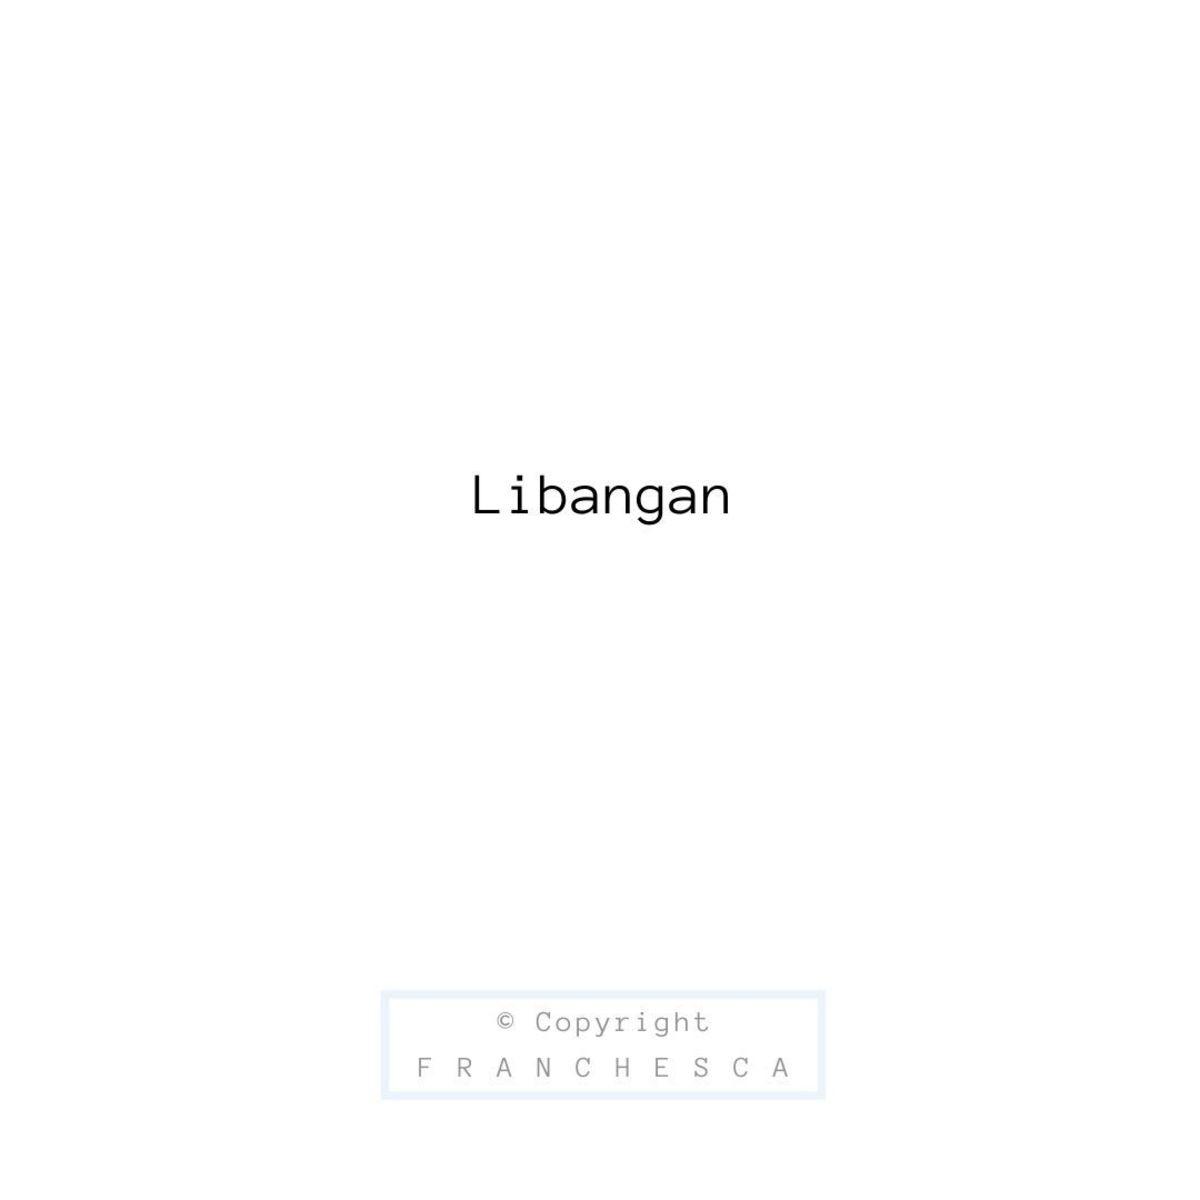 177th Article: Libangan